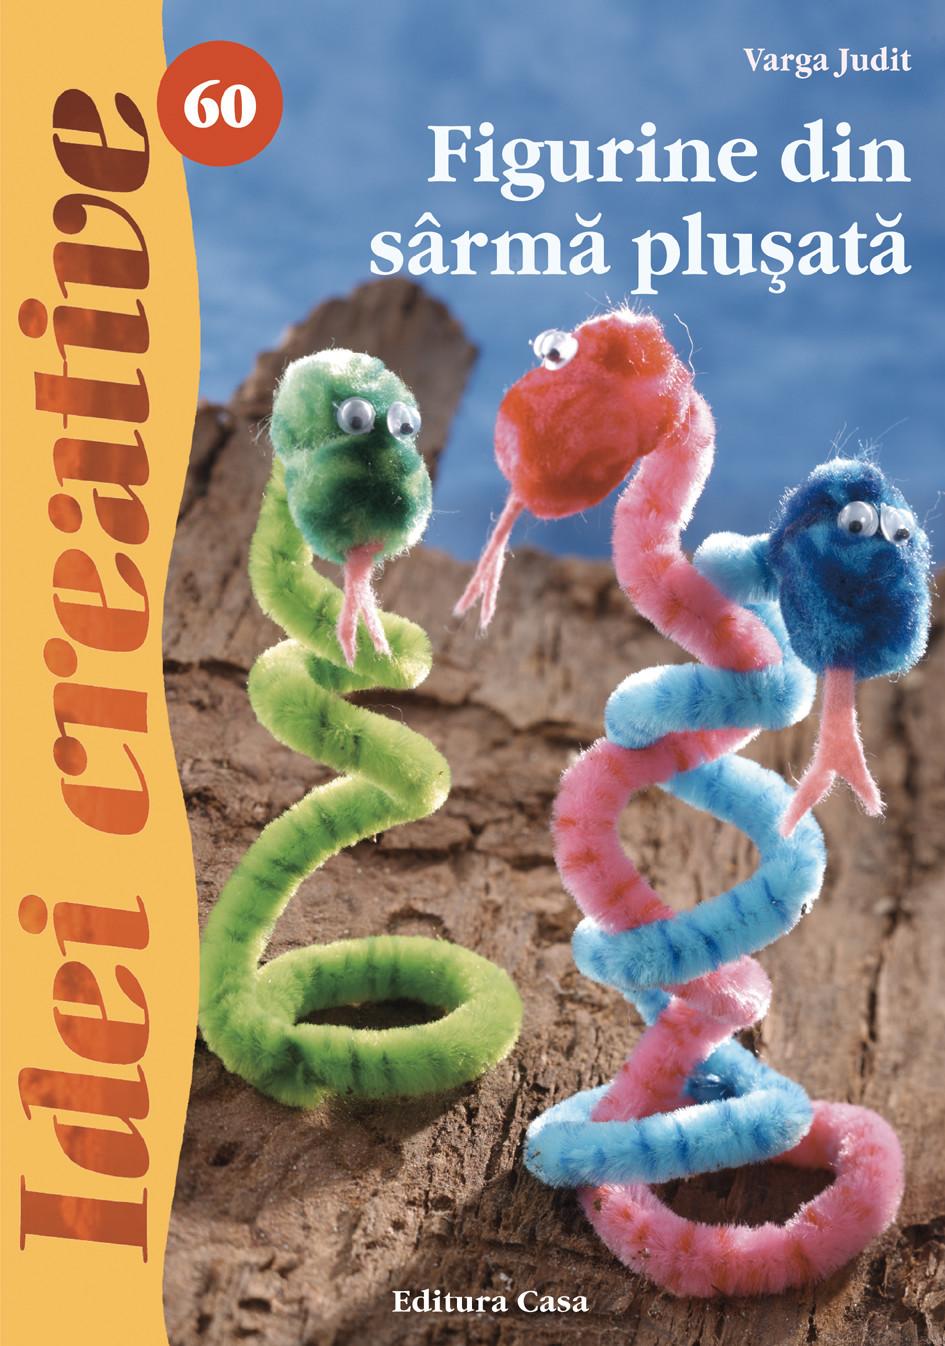 Figurine Din Sarma Plusata - Idei Creative 60